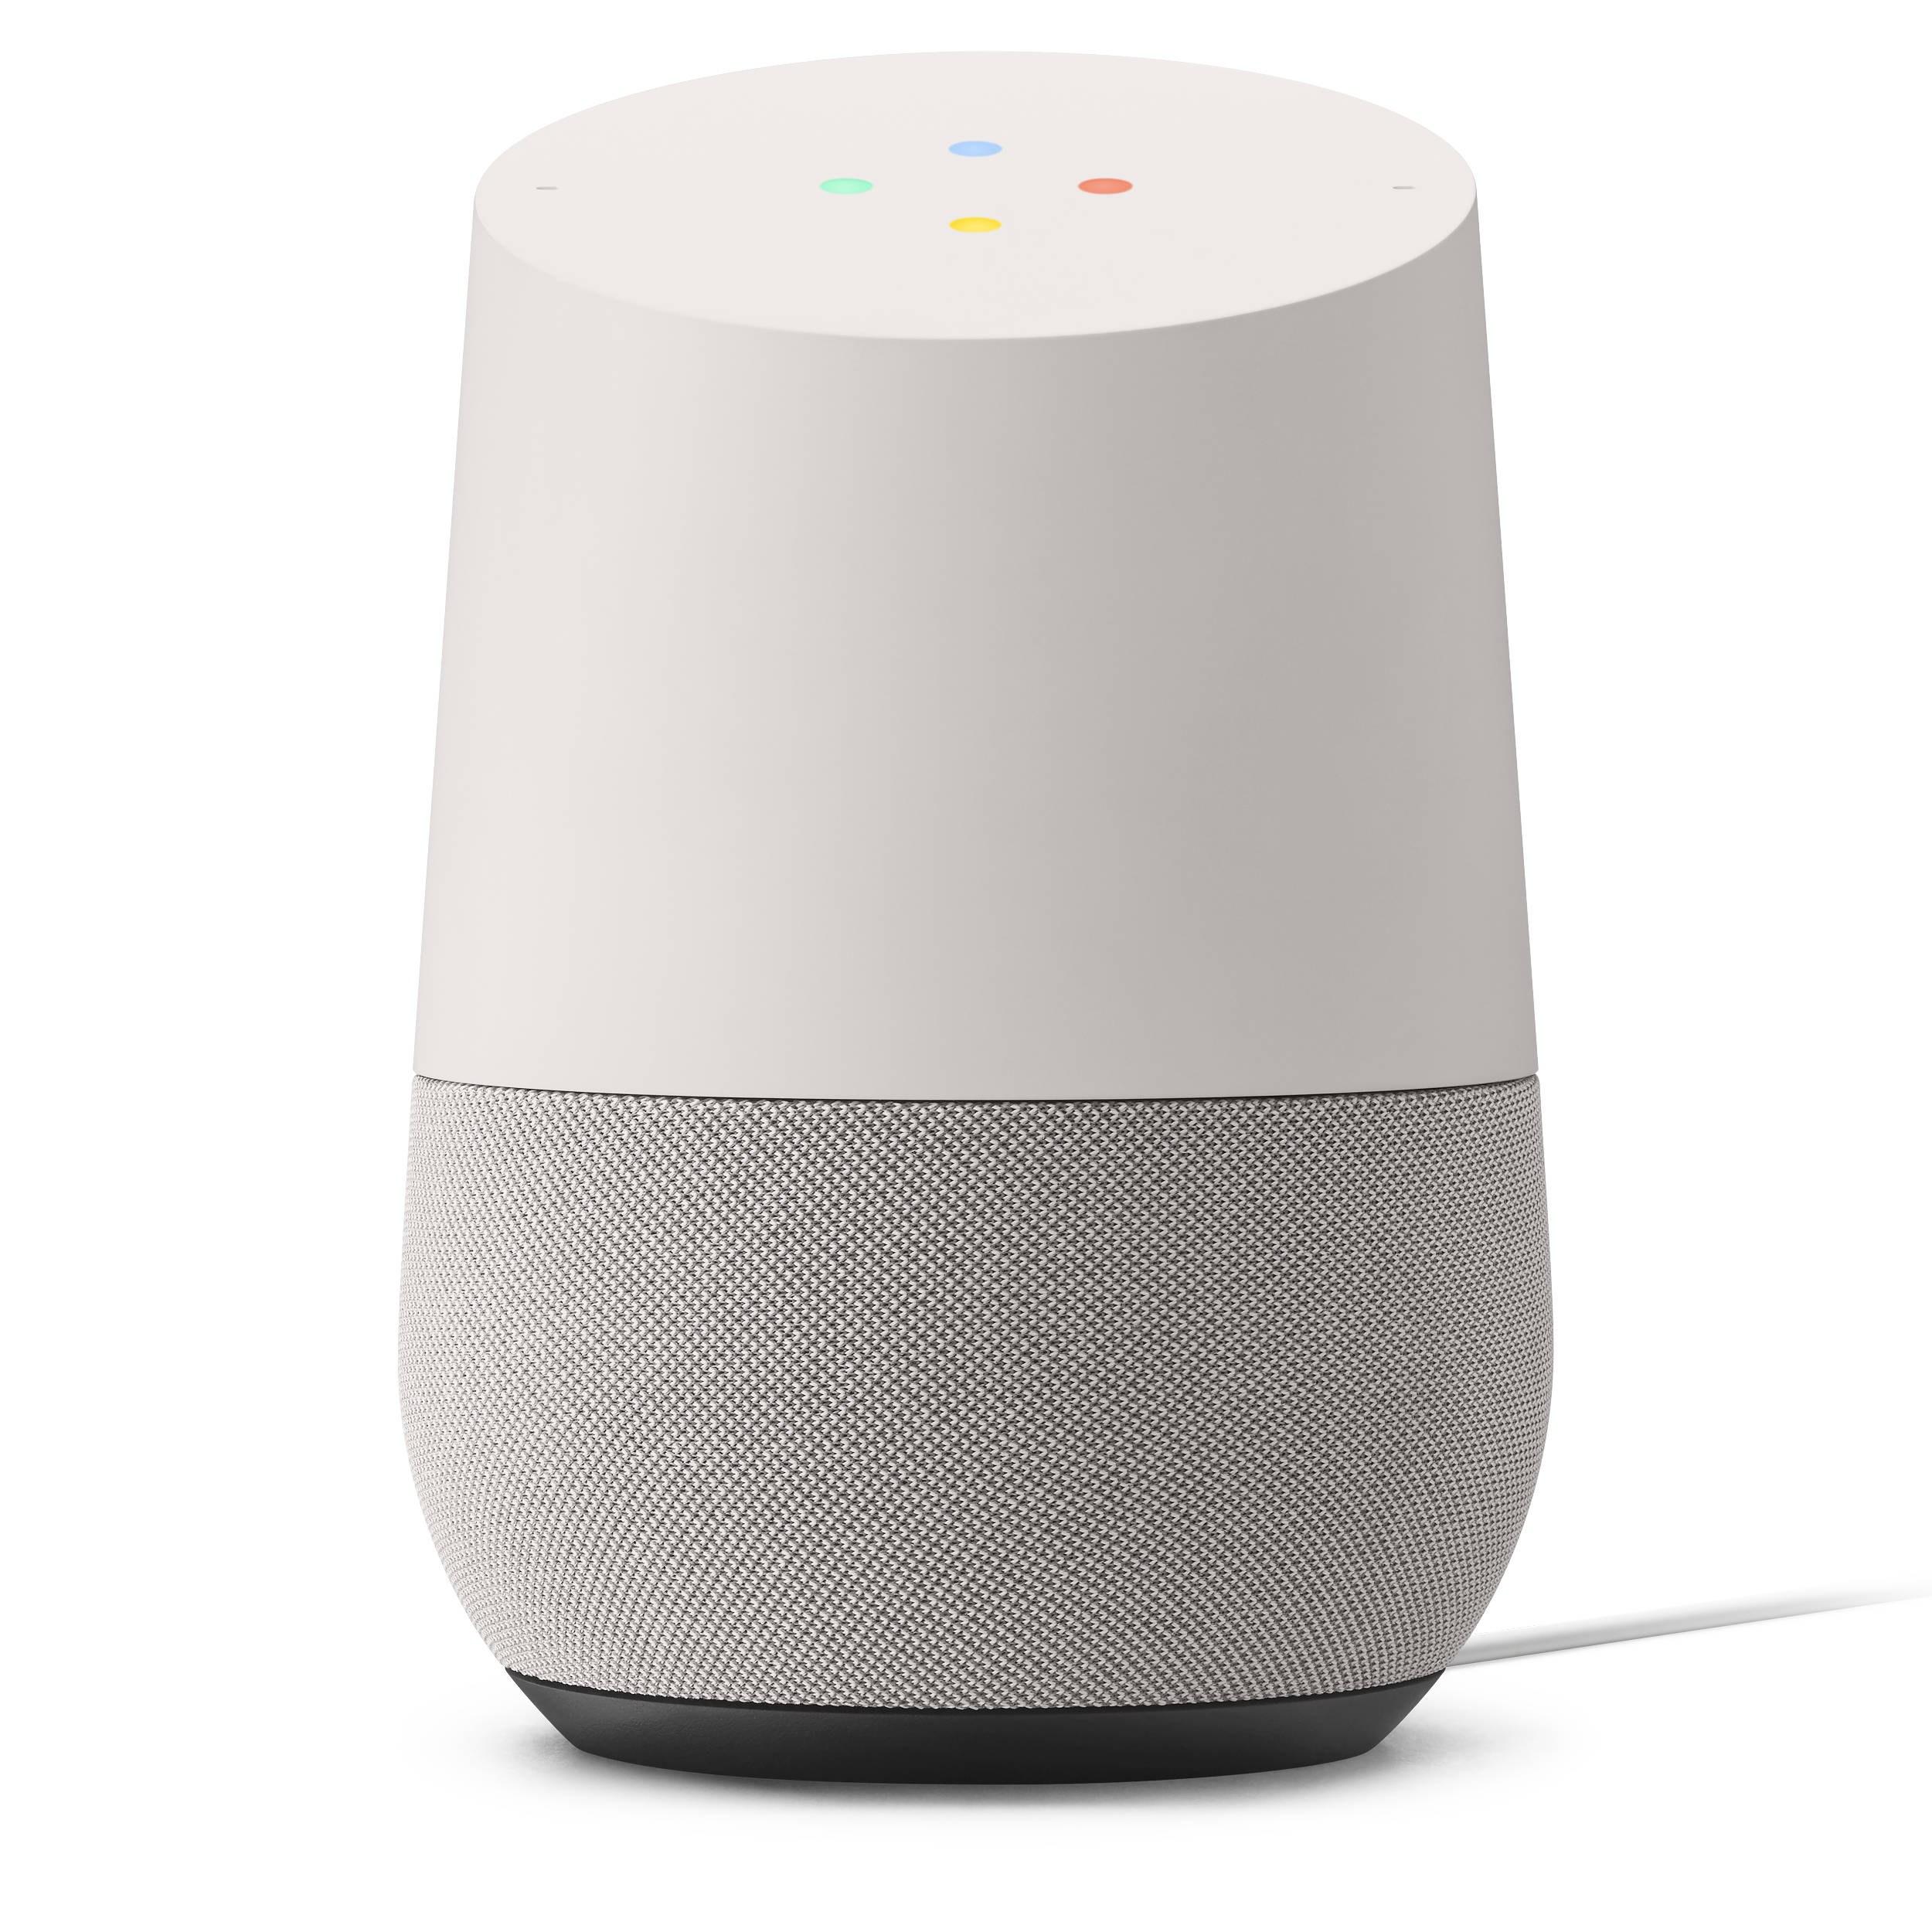 Google Home Assistant 구글홈 인공지능 AI 스마트 스피커